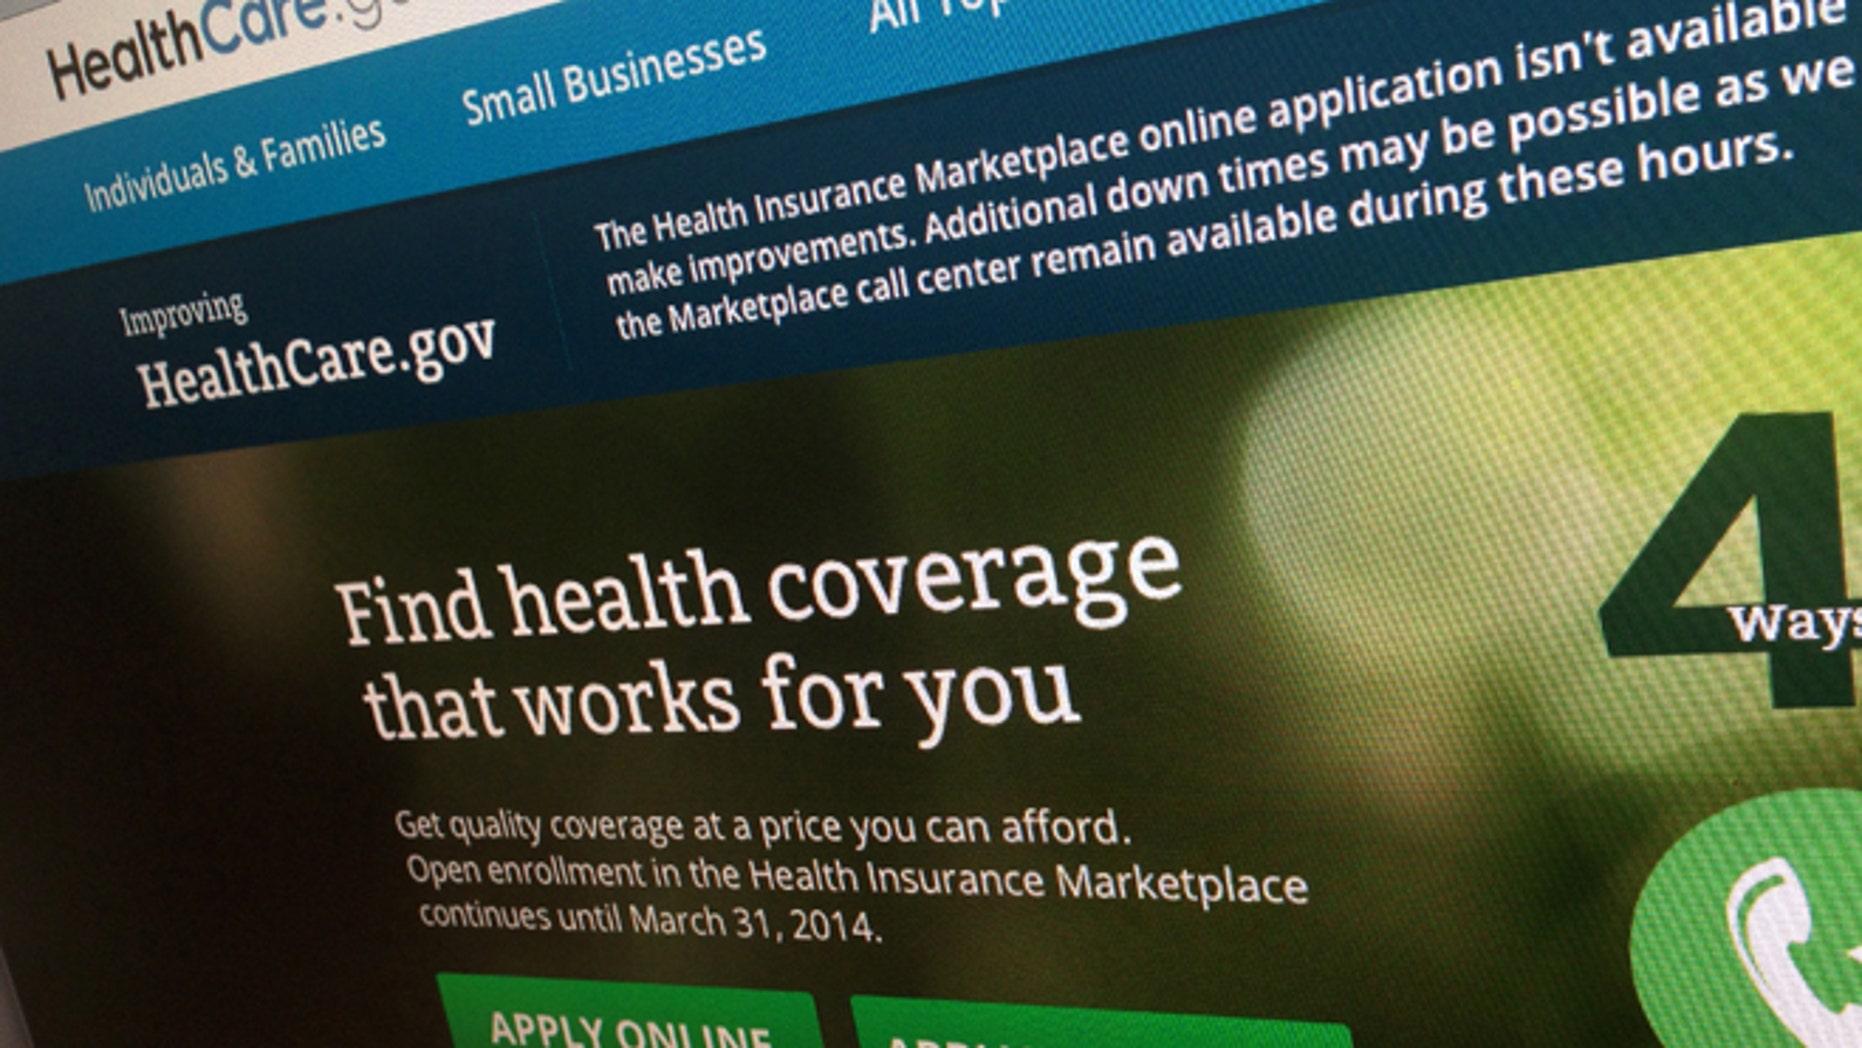 FILE: Nov. 29, 2013: The HealthCare.gov website is photographed in Washington, D.C.